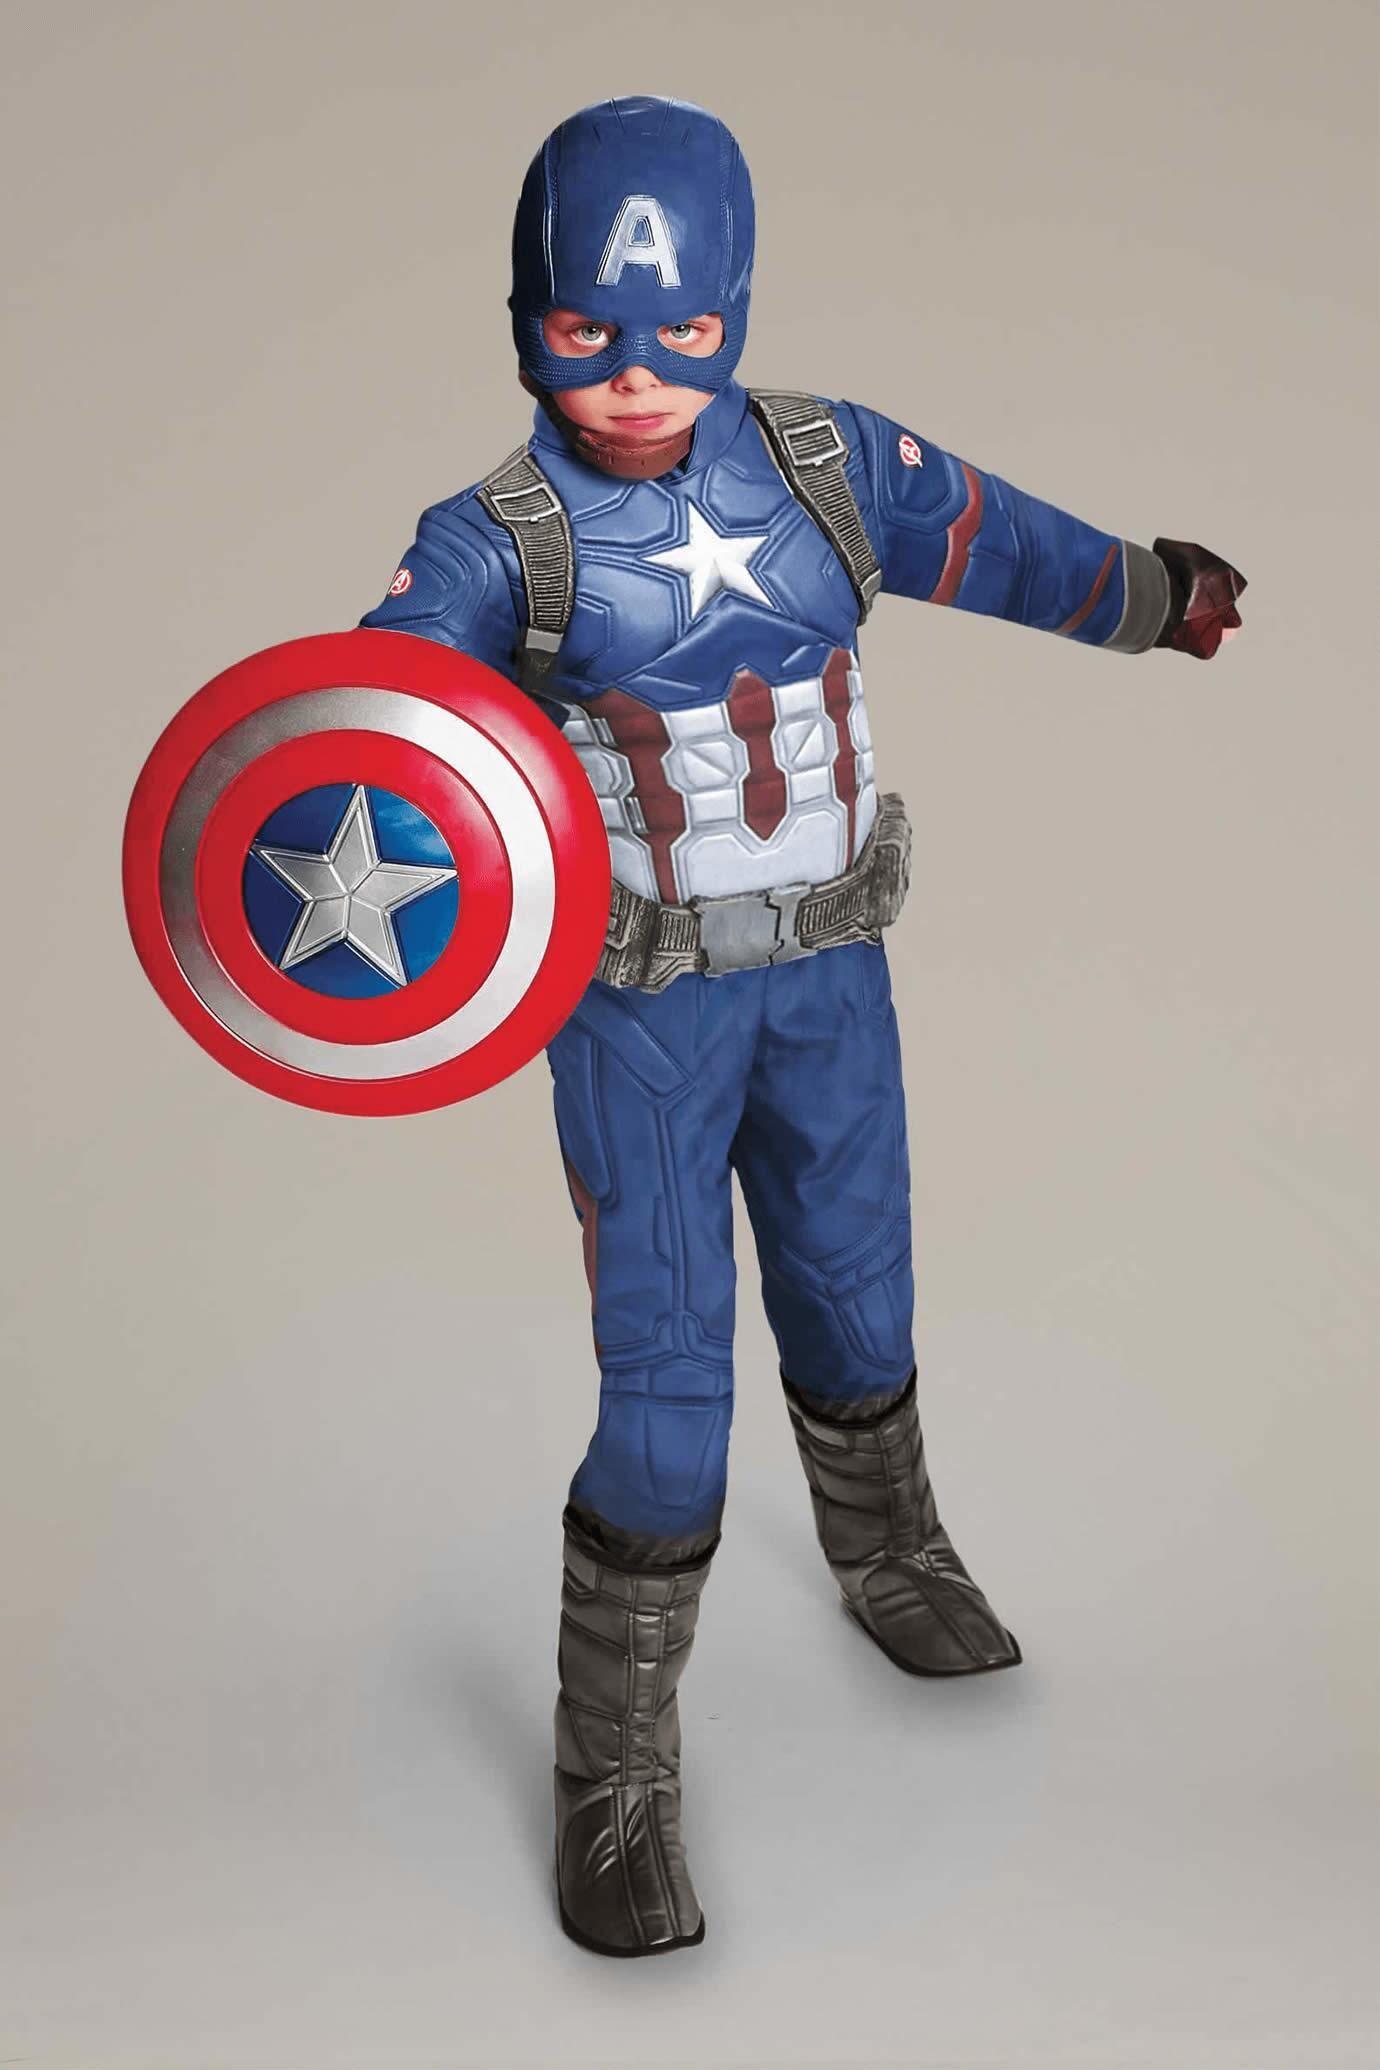 Ultimate Captain America® Costume For Kids - Civil War #Chasingfireflies $89.00 & Ultimate Captain America® Costume For Kids - Civil War | Pinterest ...